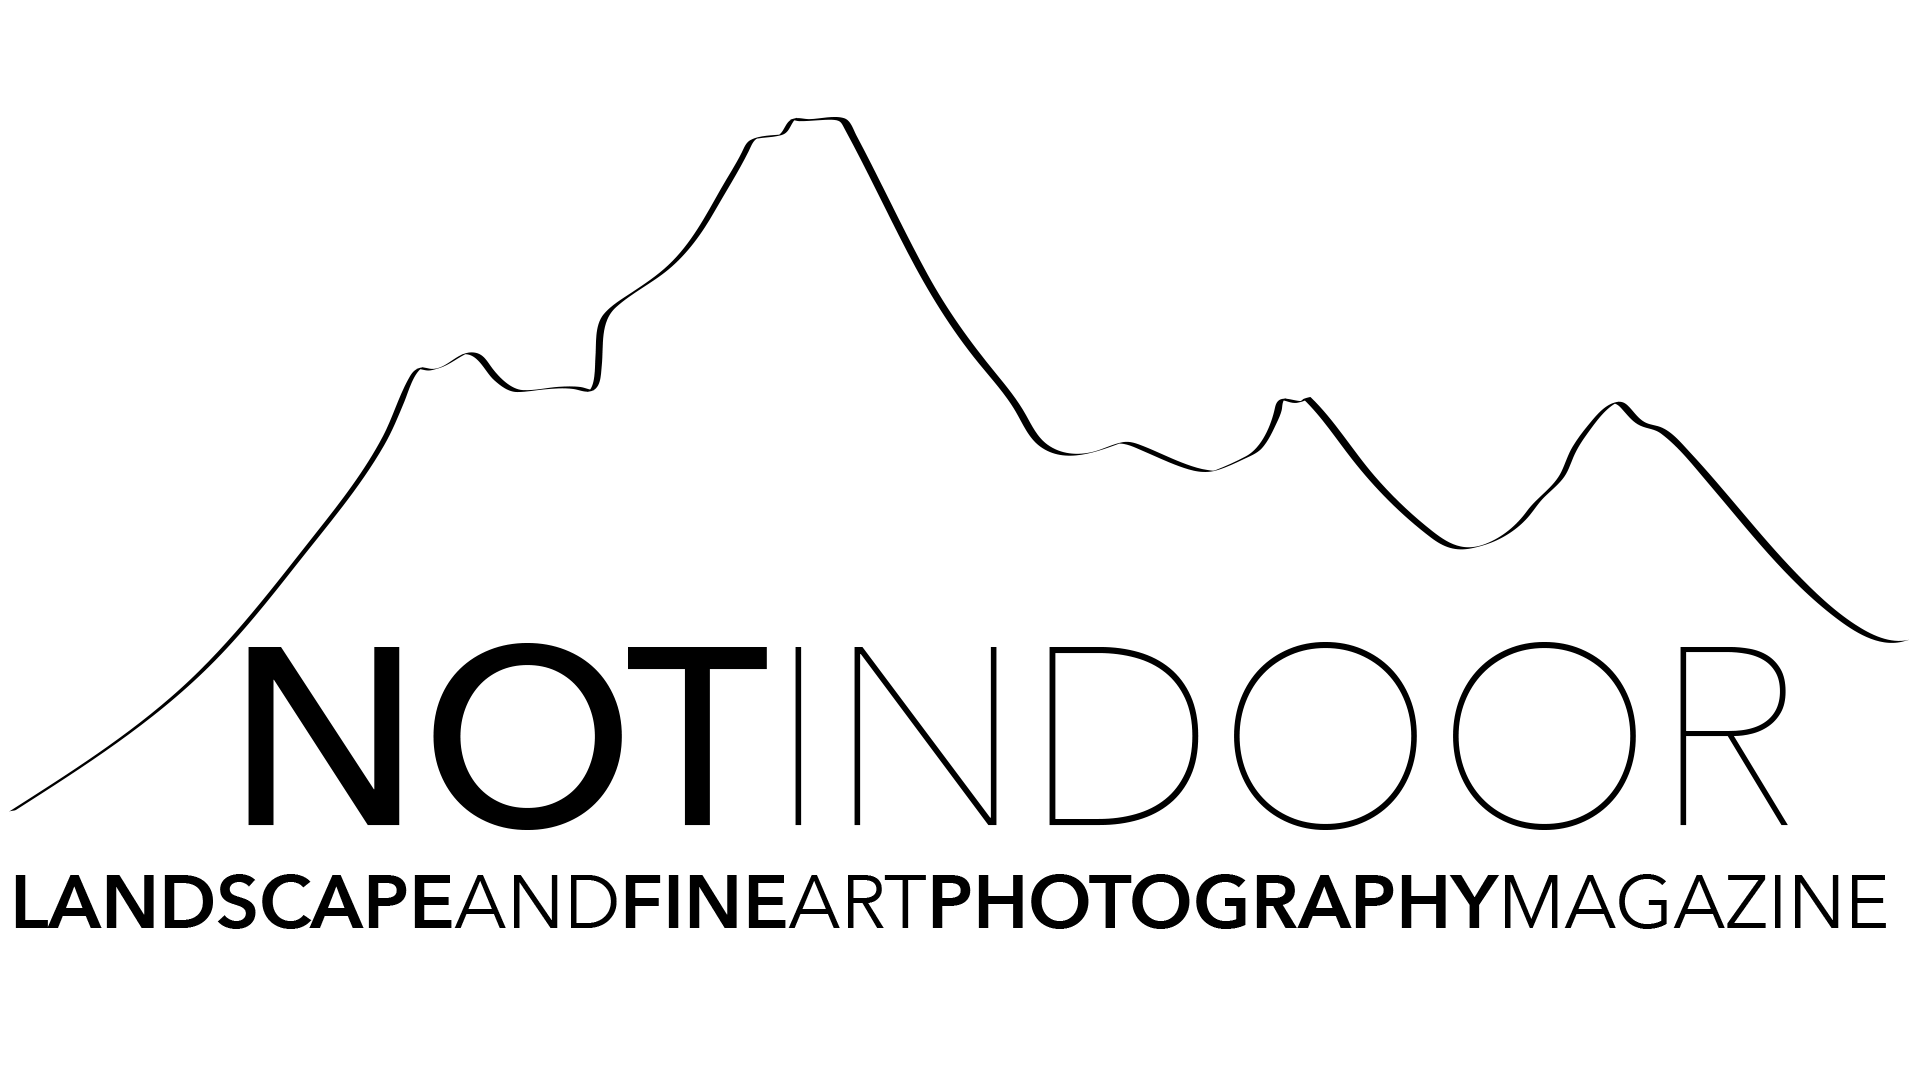 NOTINDOOR Photographer of the Year Awards 2017 - logo